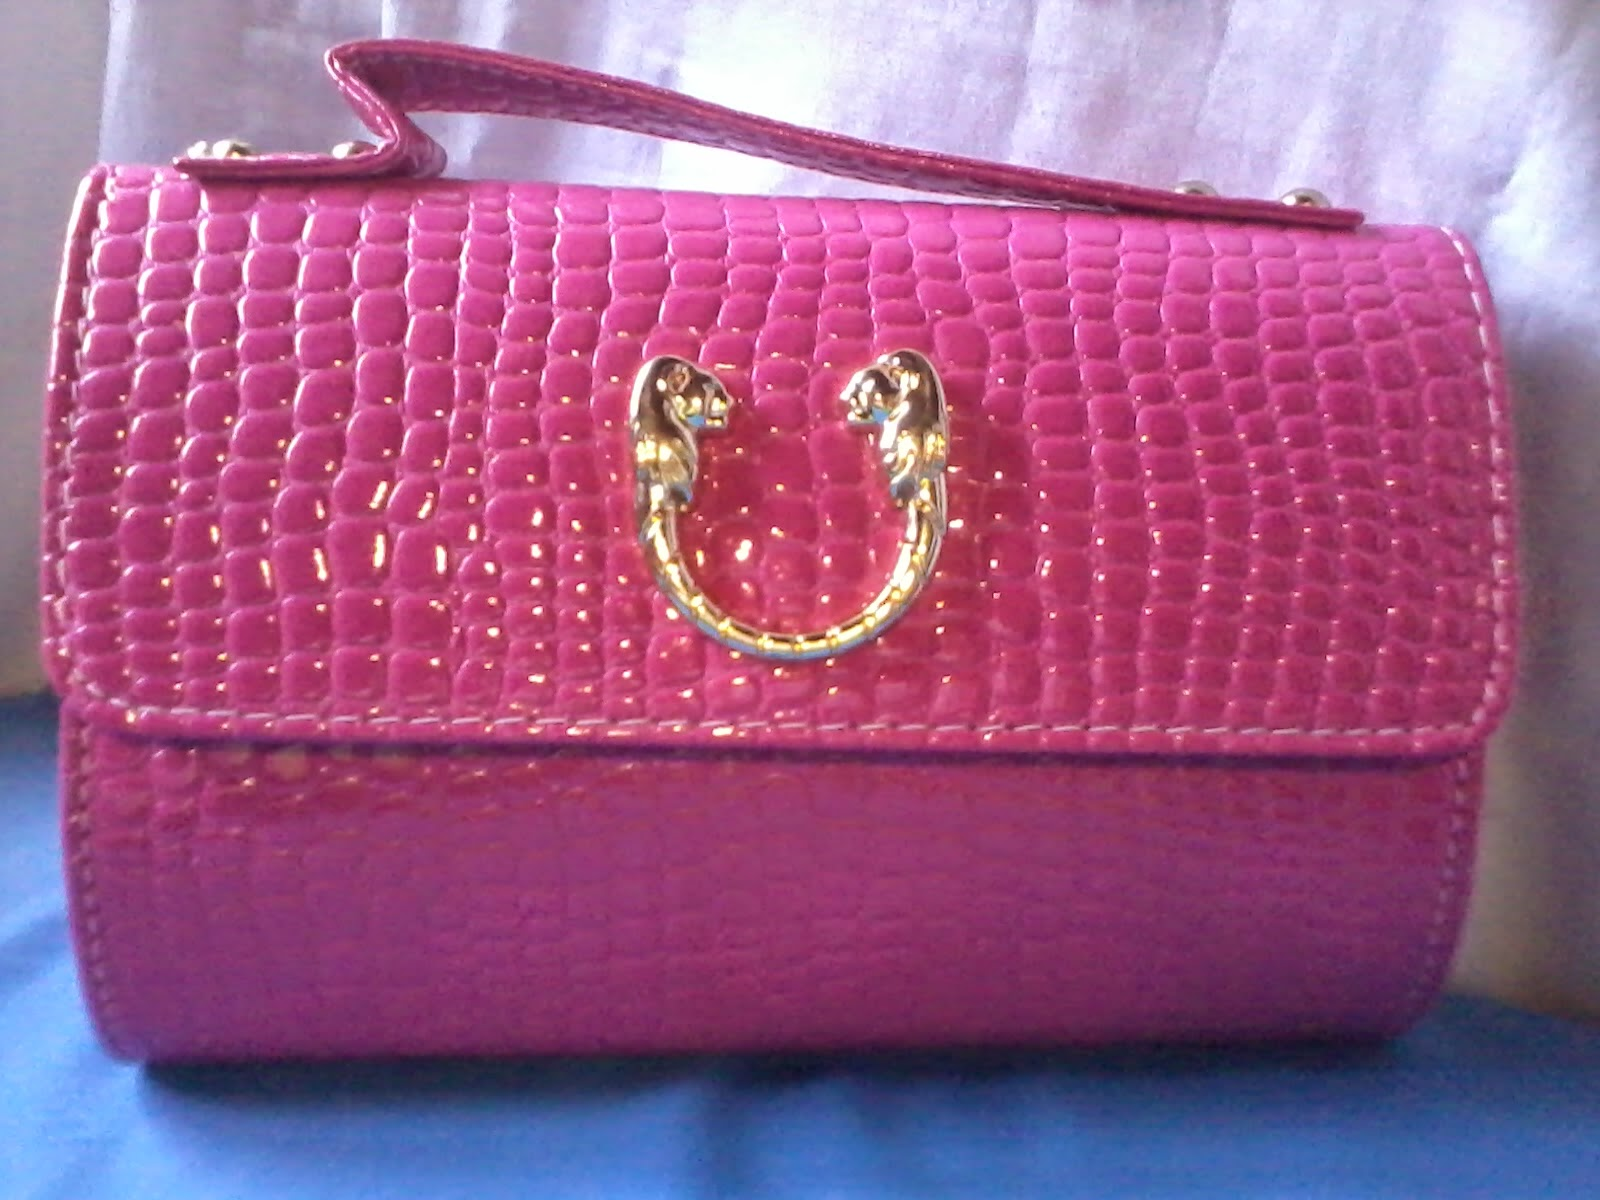 pinkist handbag, pink handbag, pink bag, sweet bag